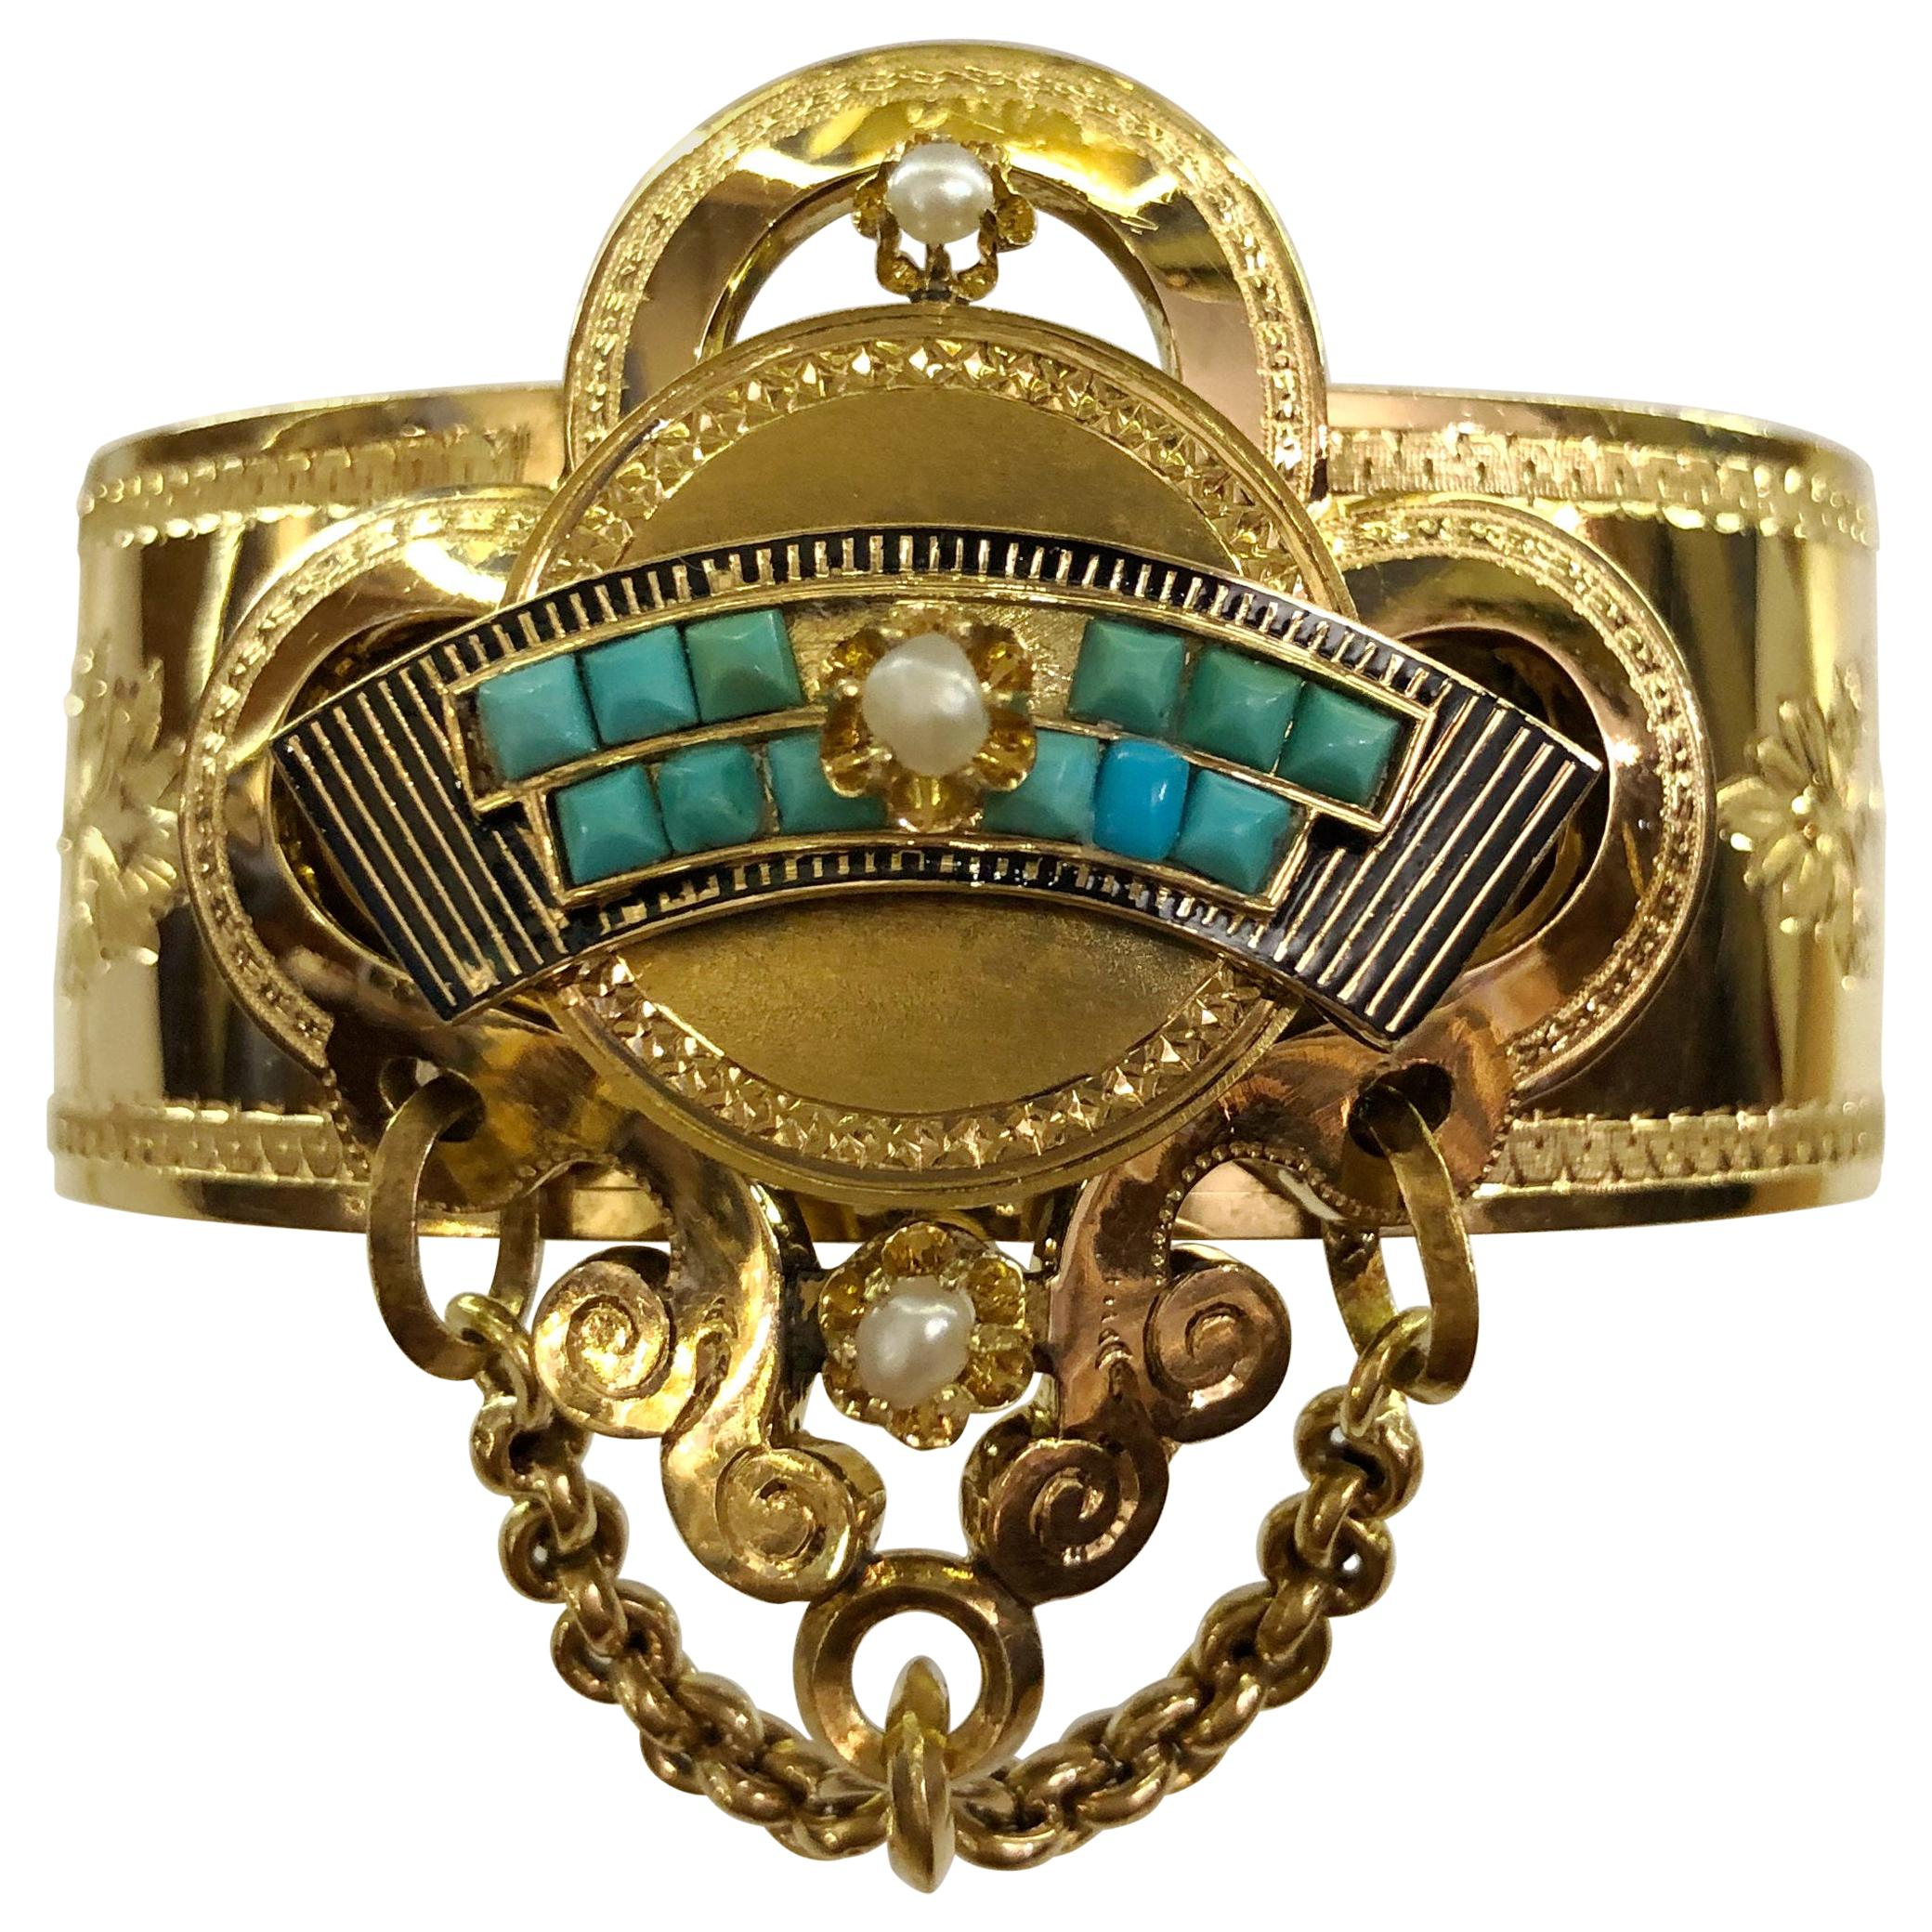 18 Karat Gold Turquoise and Pearls Bracelet